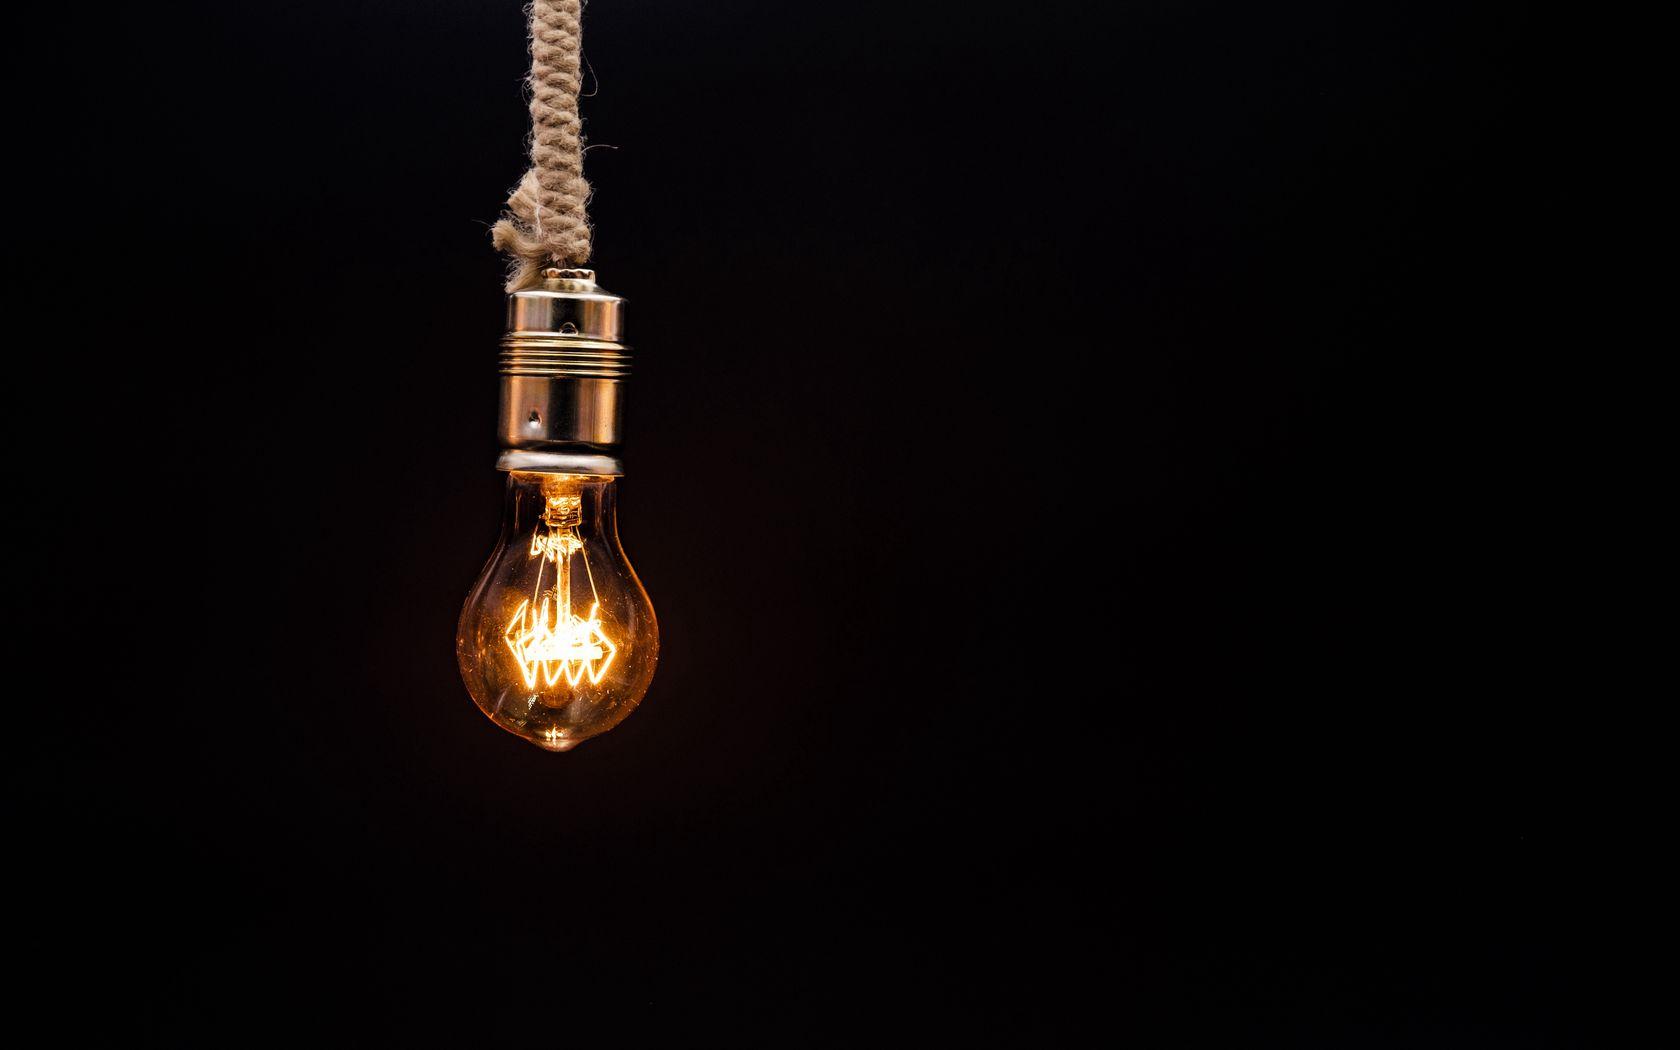 1680x1050 Wallpaper bulb, lighting, rope, electricity, edisons lamp